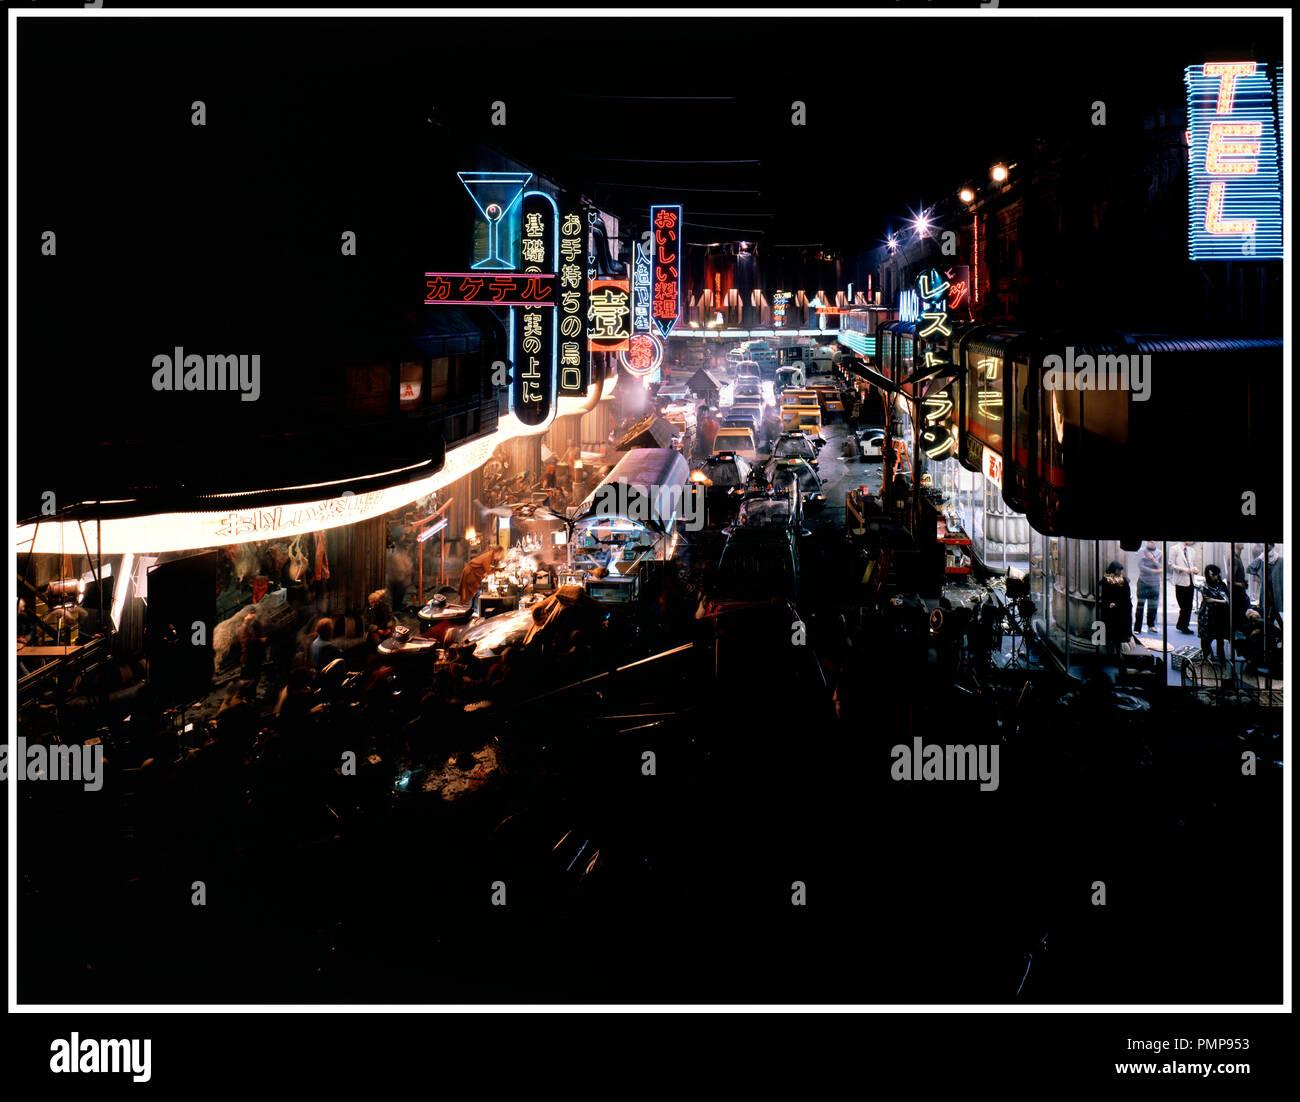 Prod DB © The Ladd Company / DR BLADE RUNNER (BLADE RUNNER) de Ridley Scott 1982 USA - Stock Image